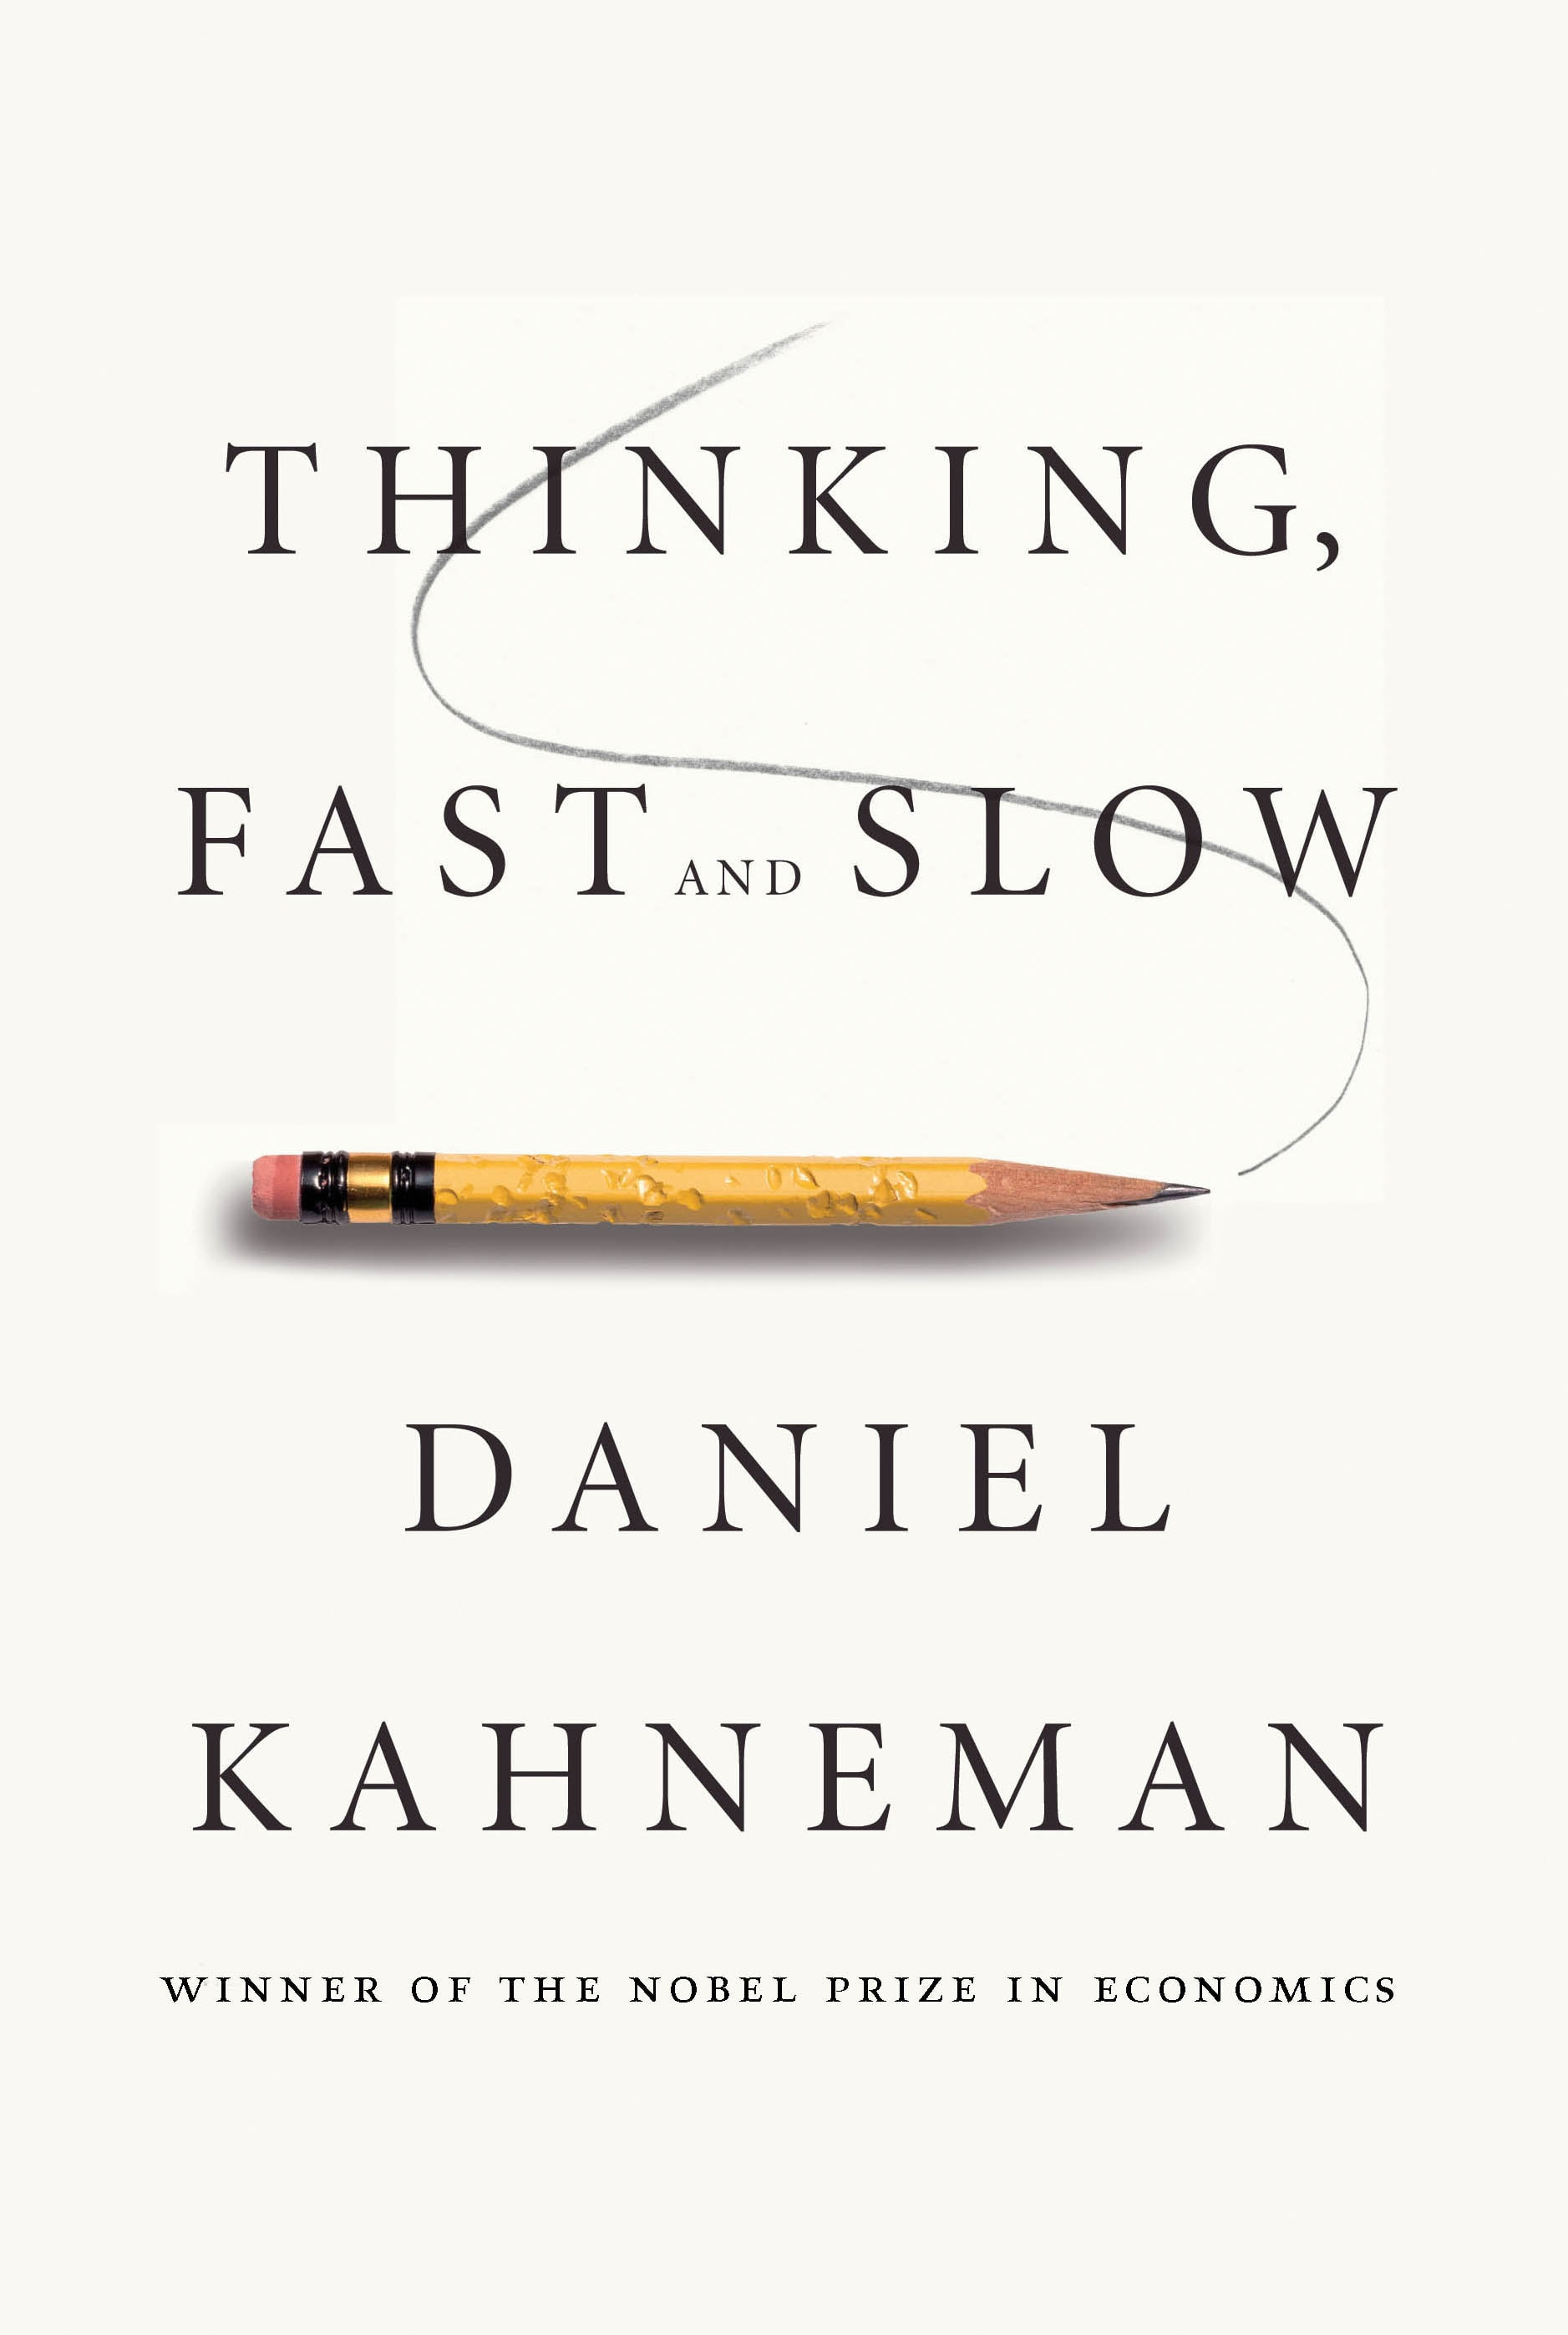 Thinking Fast and Slow – Daniel Kahneman